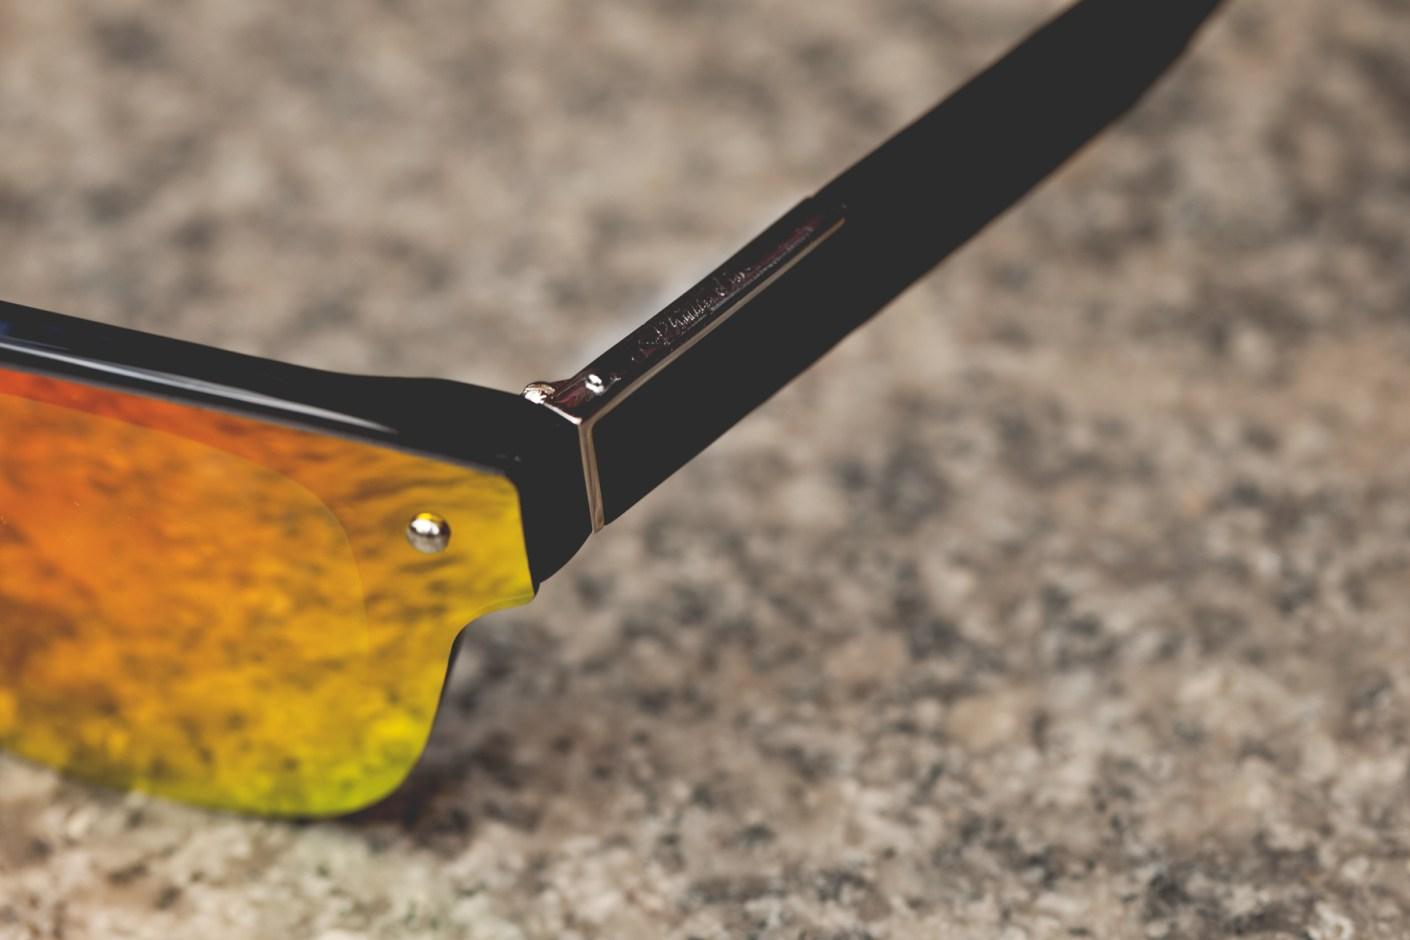 Image of 3.1 Phillip Lim x Linda Farrow 2014 Spring/Summer Sunglasses